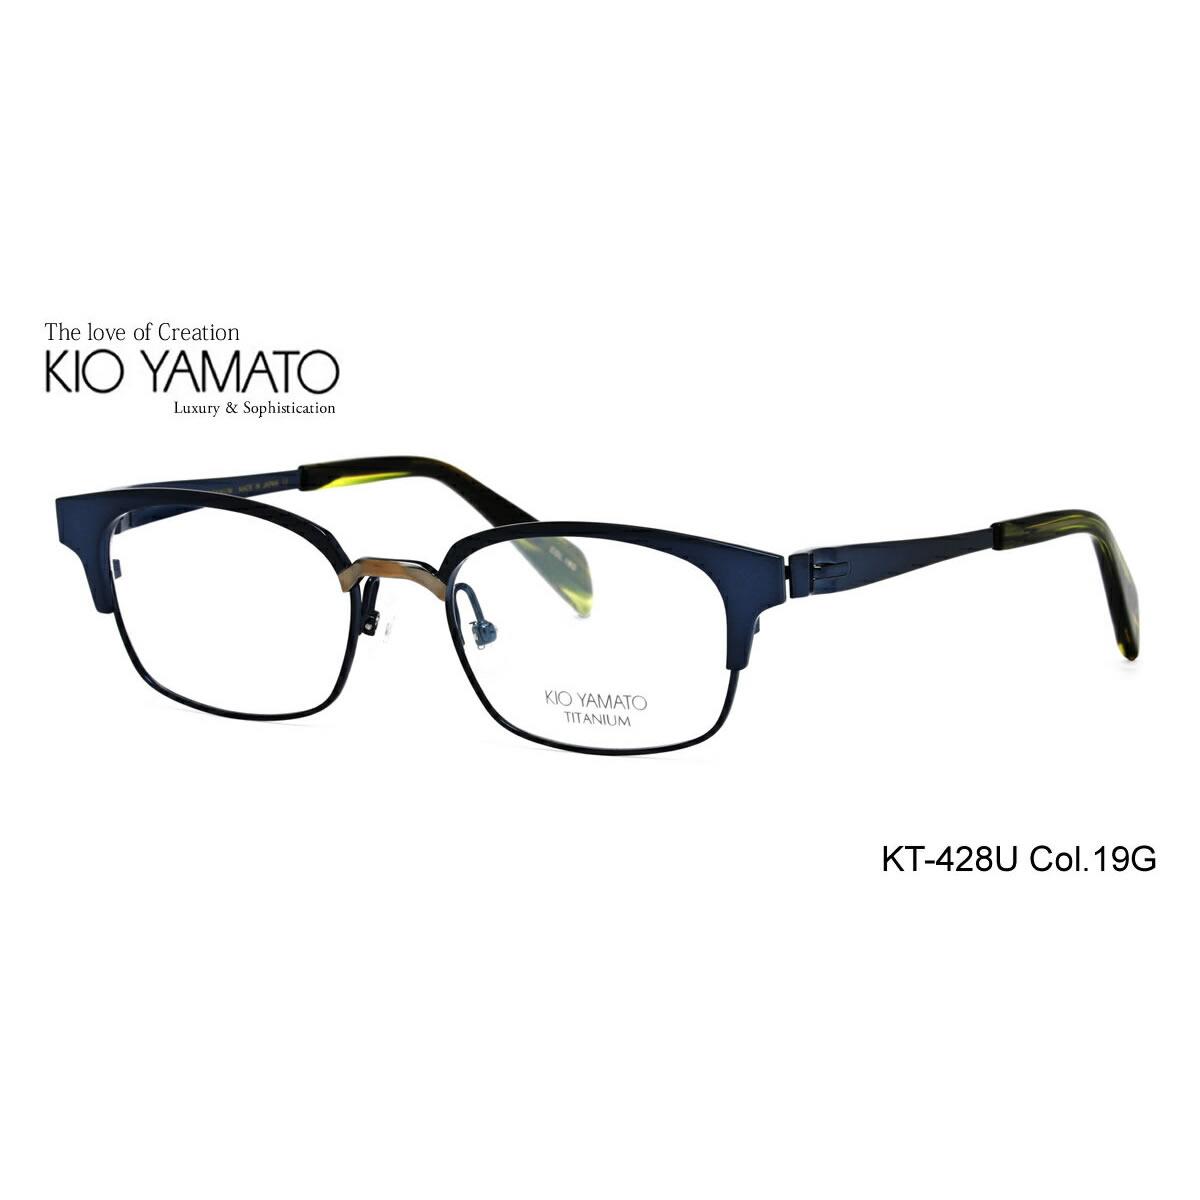 KIO YAMATO メガネ キオヤマト メガネフレーム KT428U 19G 52 あす楽対応